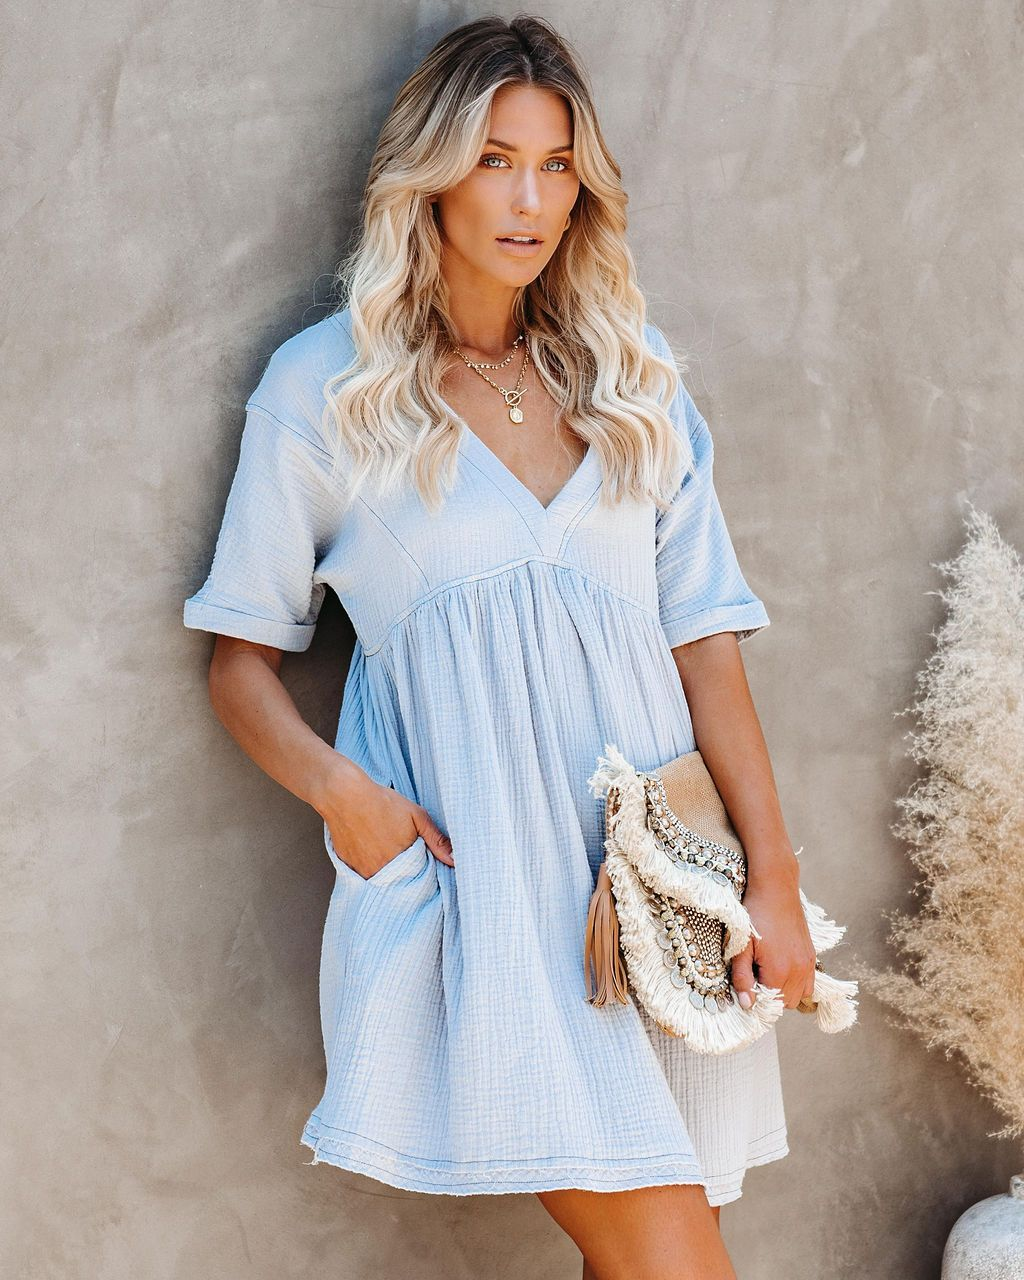 Violetta Cotton Pocketed Babydoll Dress Light Blue Vici Babydoll Dress Maternity Dresses Dresses [ 1280 x 1024 Pixel ]